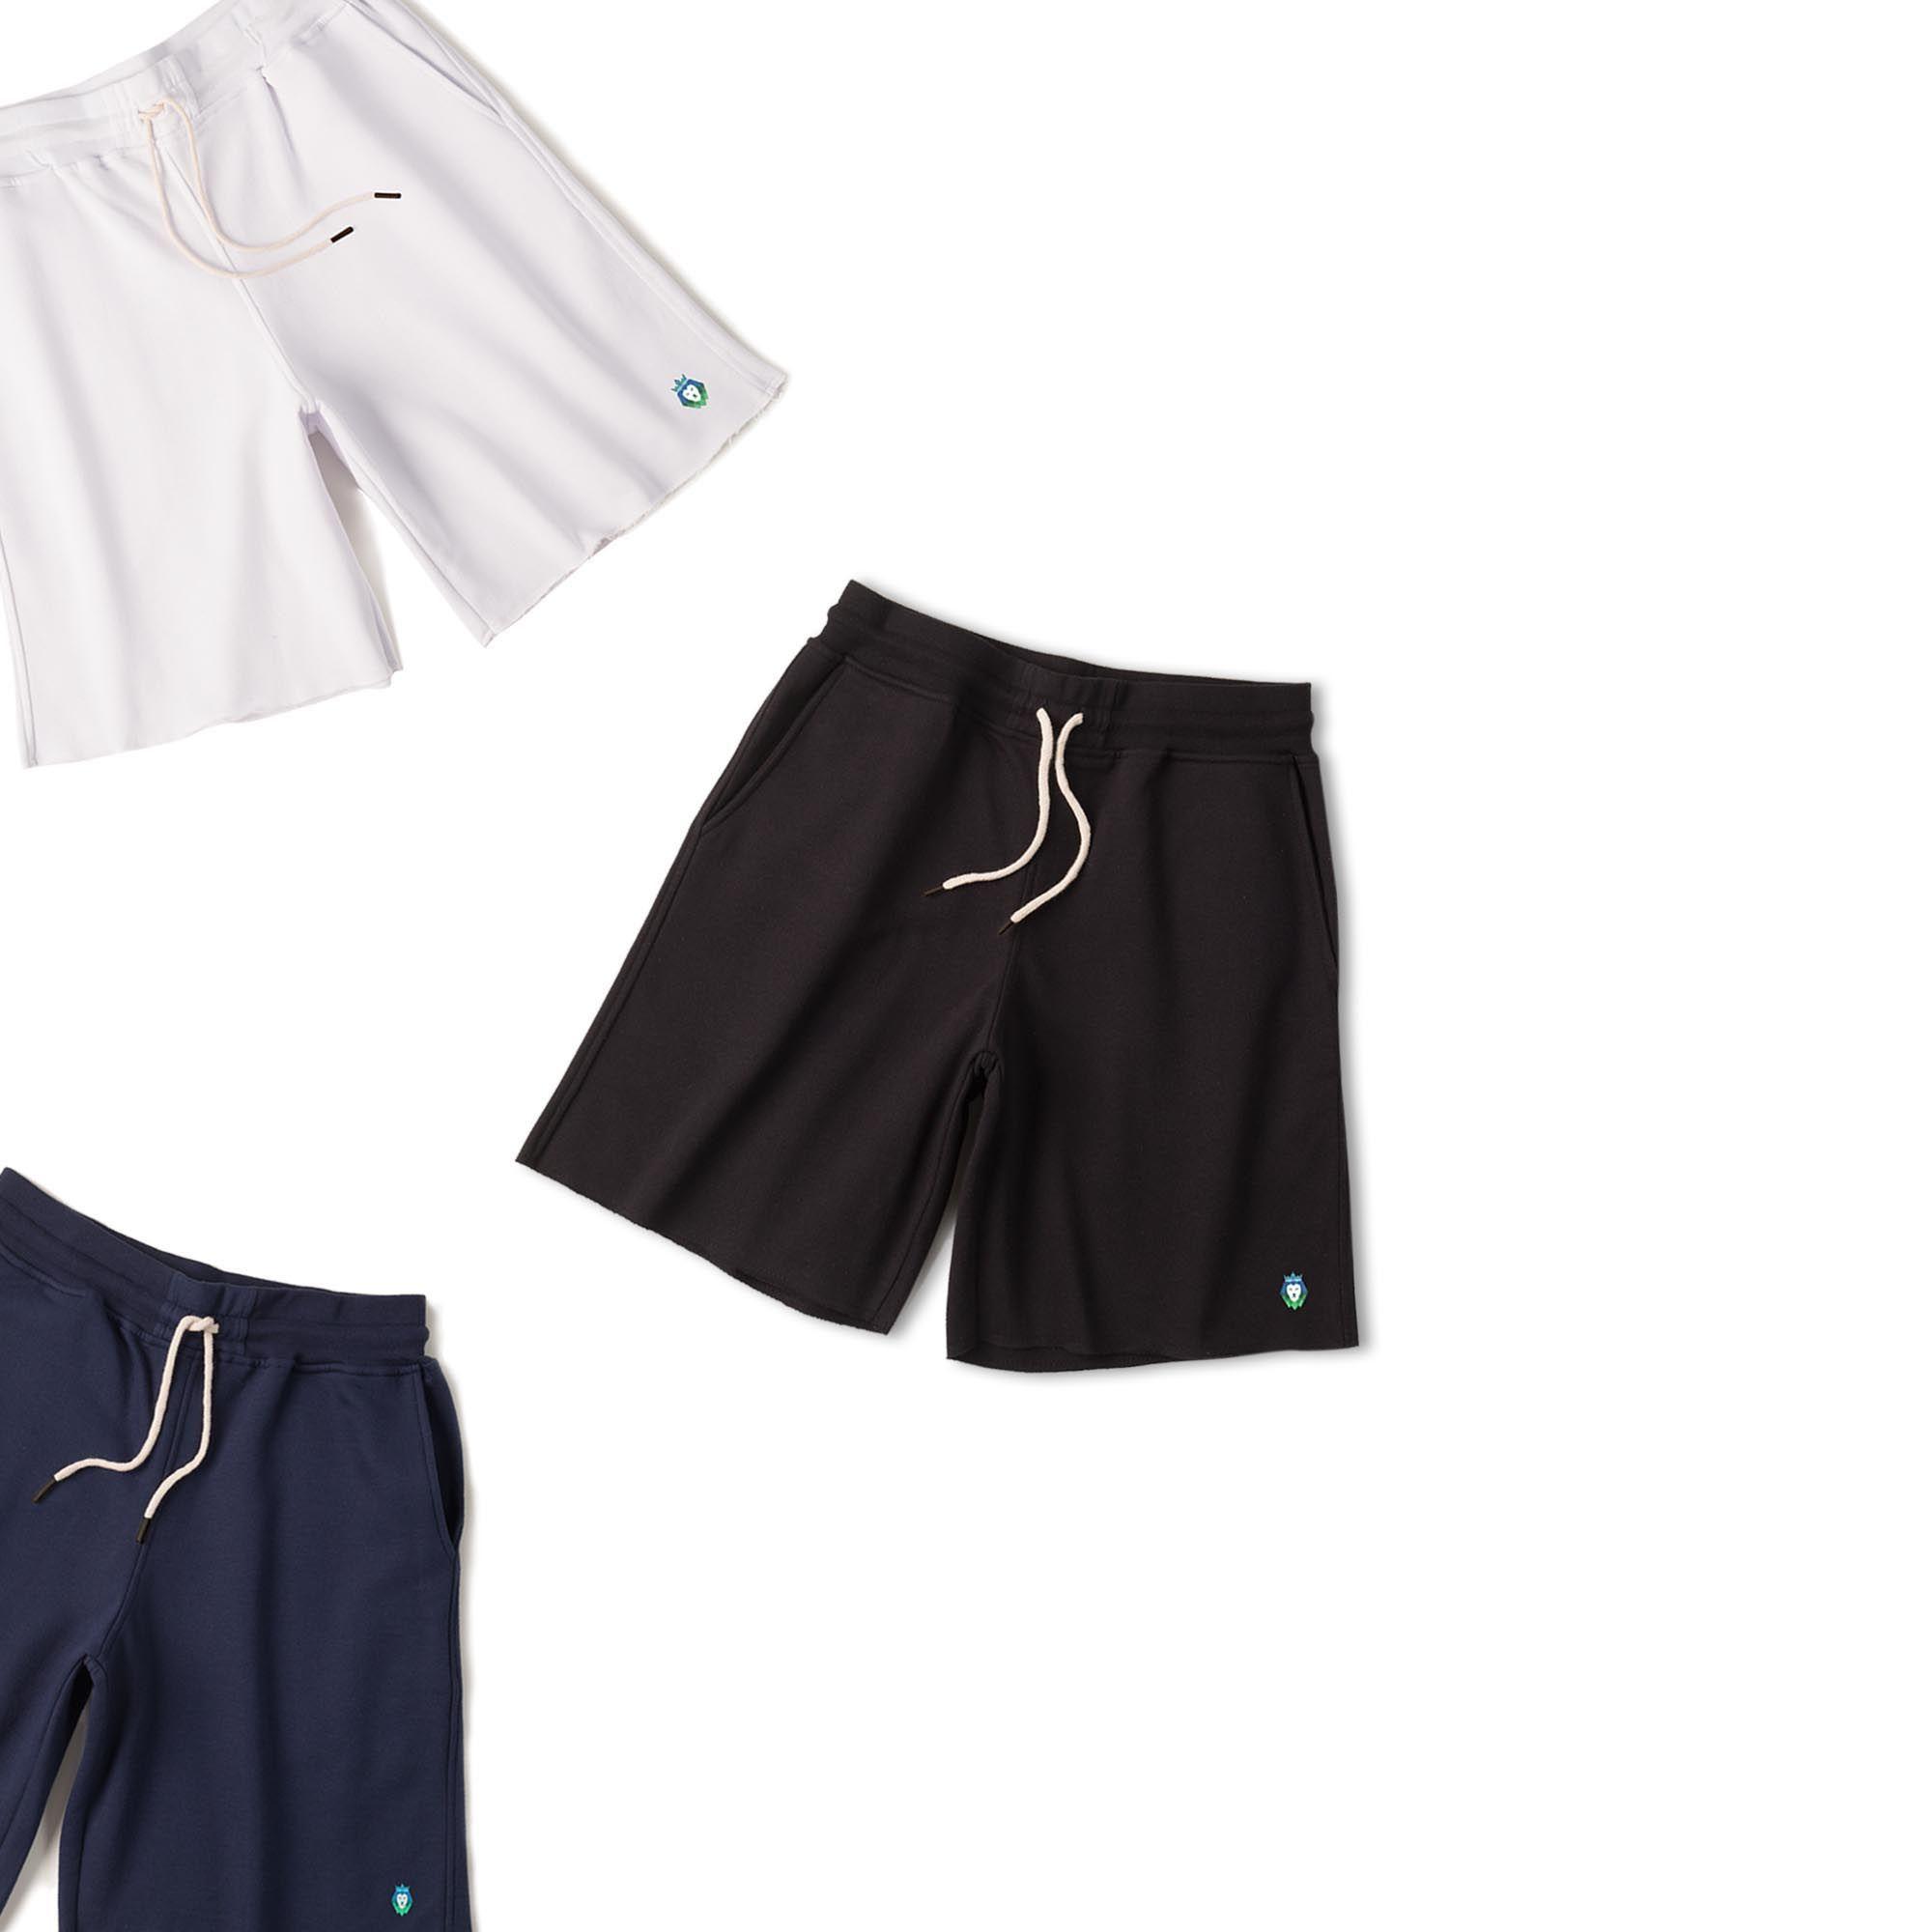 Kit 3 Bermudas Basic Zaiden Preta Branca Azul Marinho Masculina